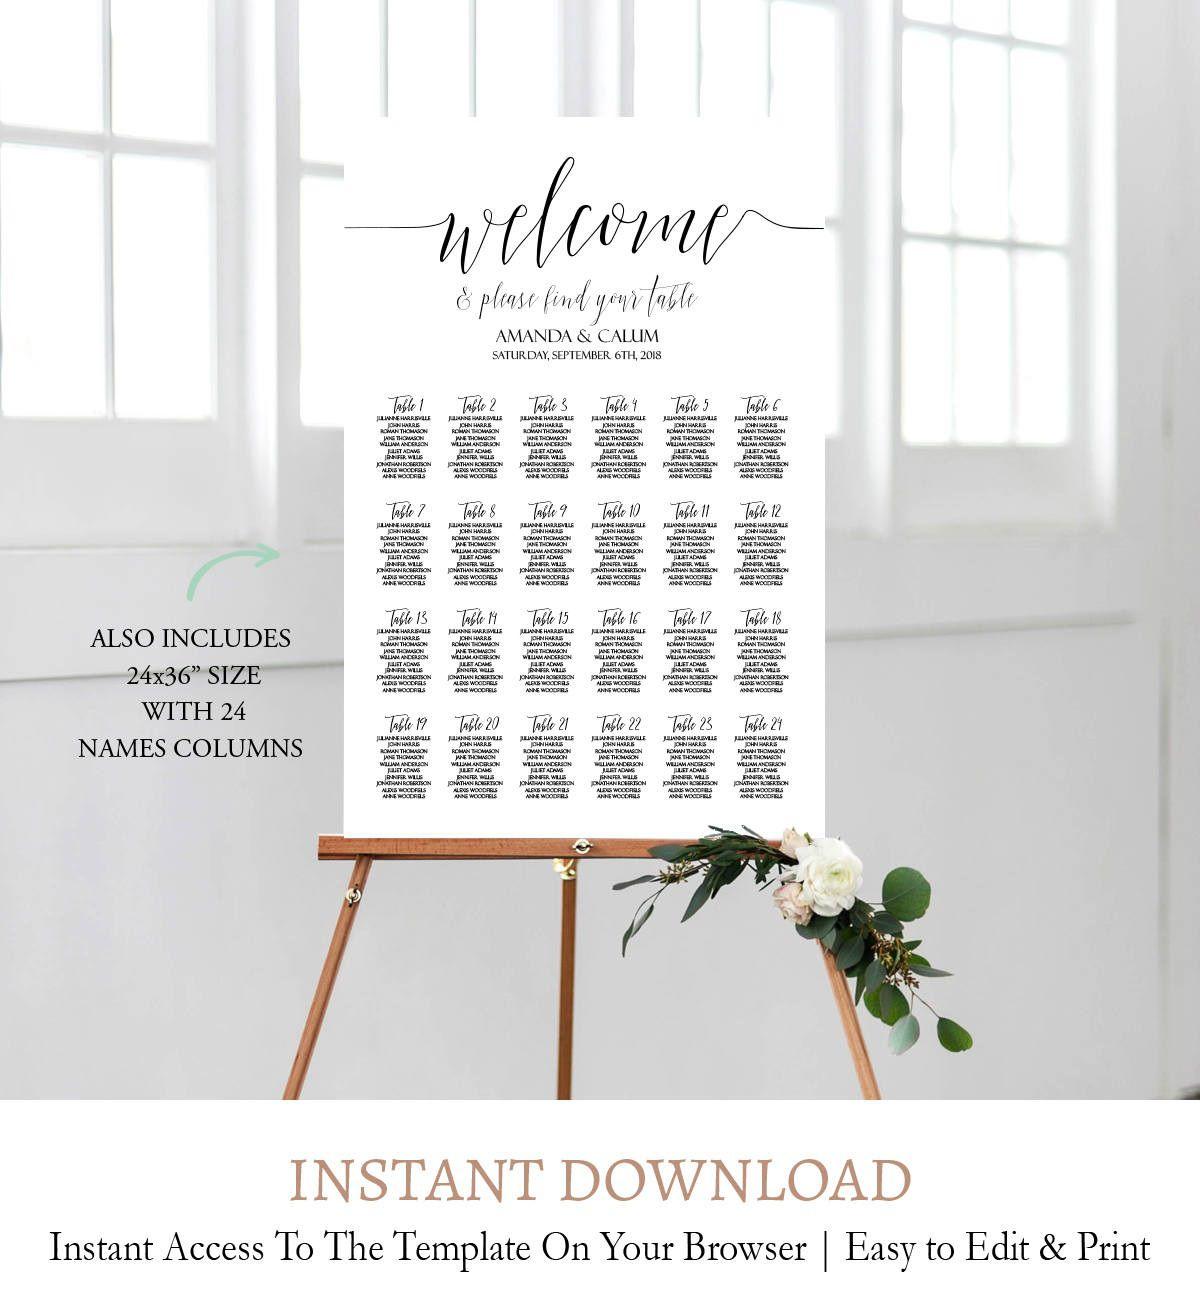 006 Surprising Wedding Seating Chart Template Image  Templates Plan Excel Word MicrosoftFull